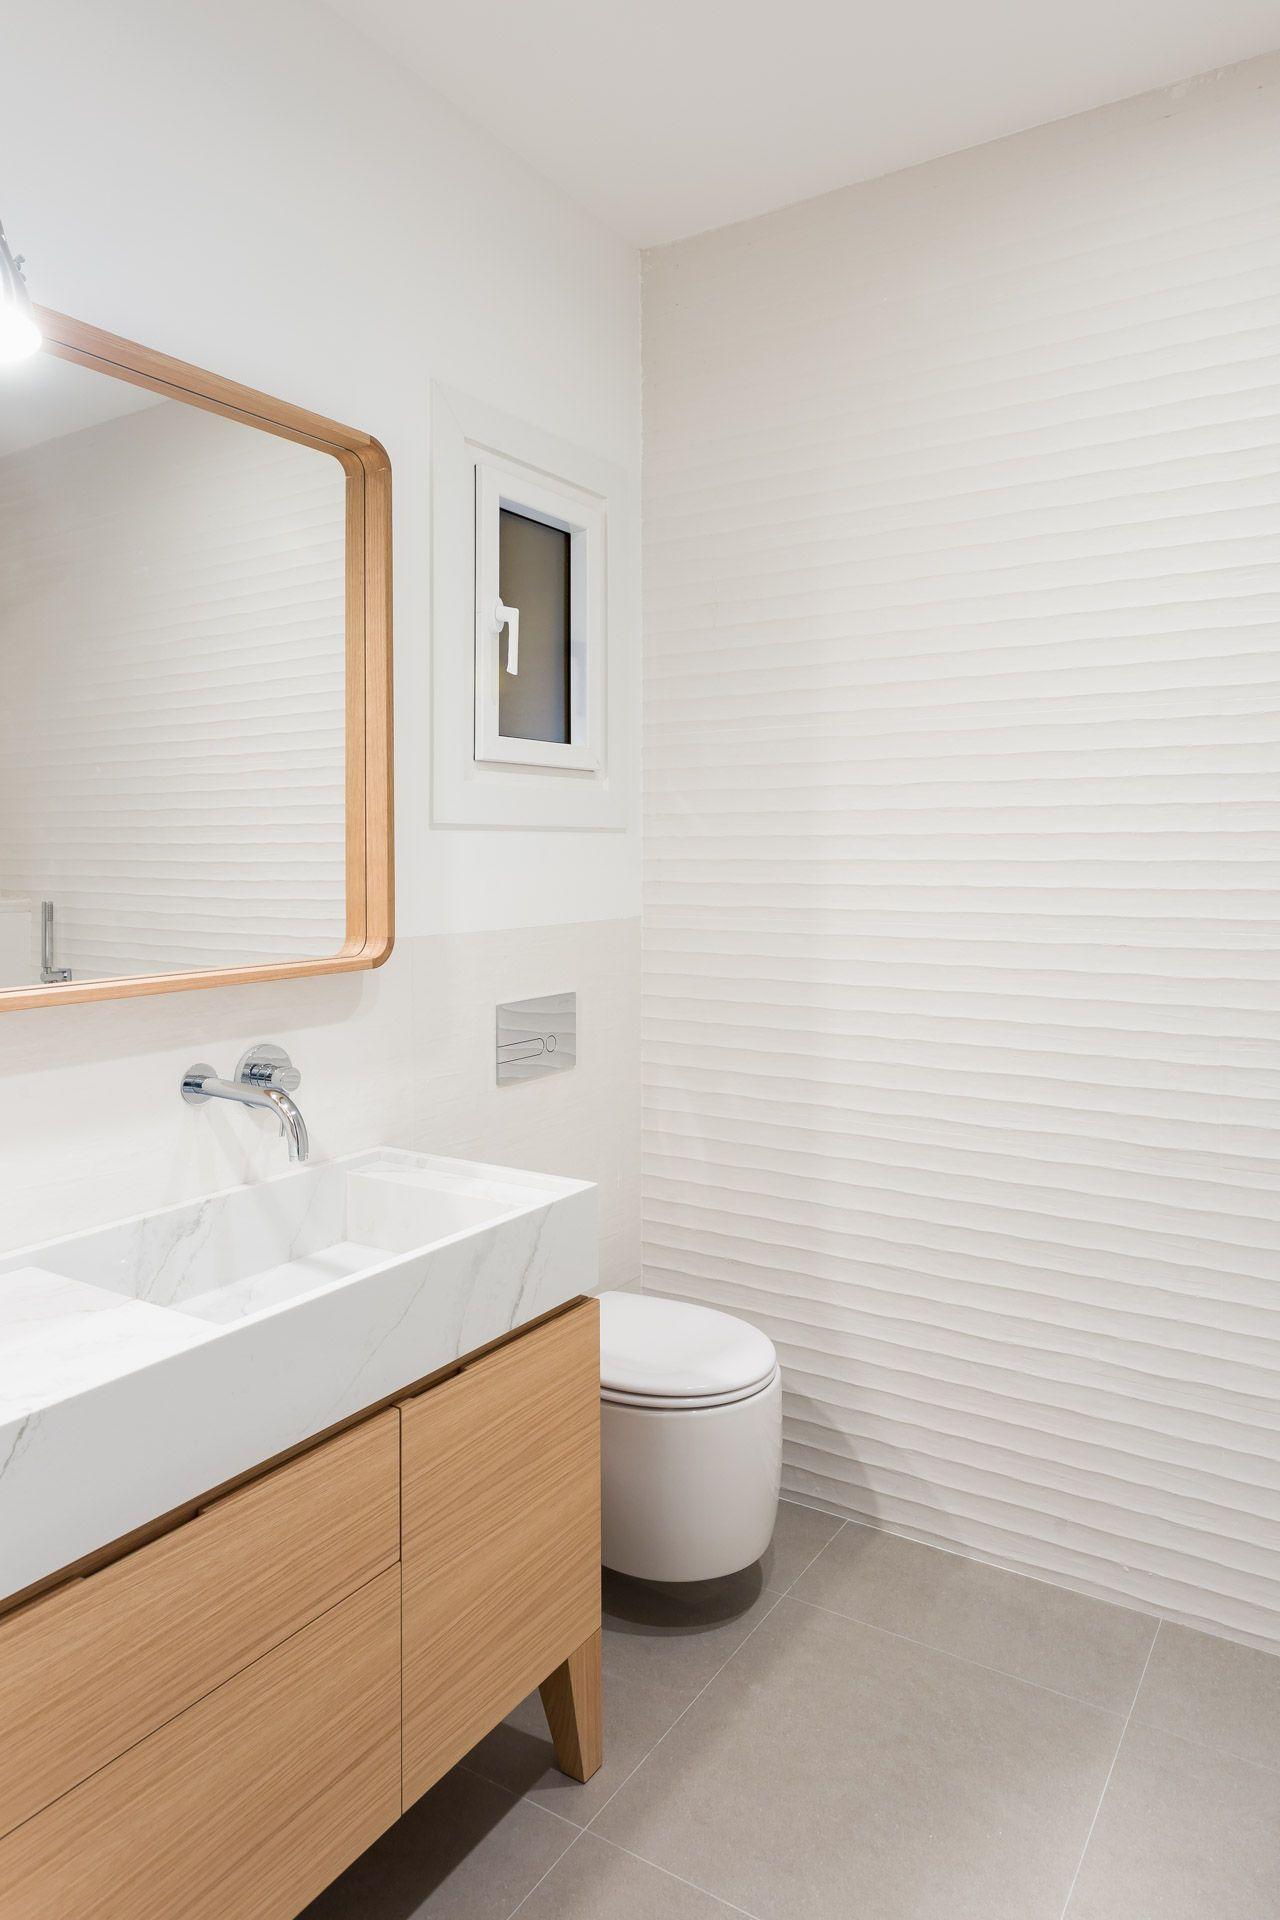 Abracadabra Decor Vigo Home Staging Compostela reforma integral de vivienda - baño